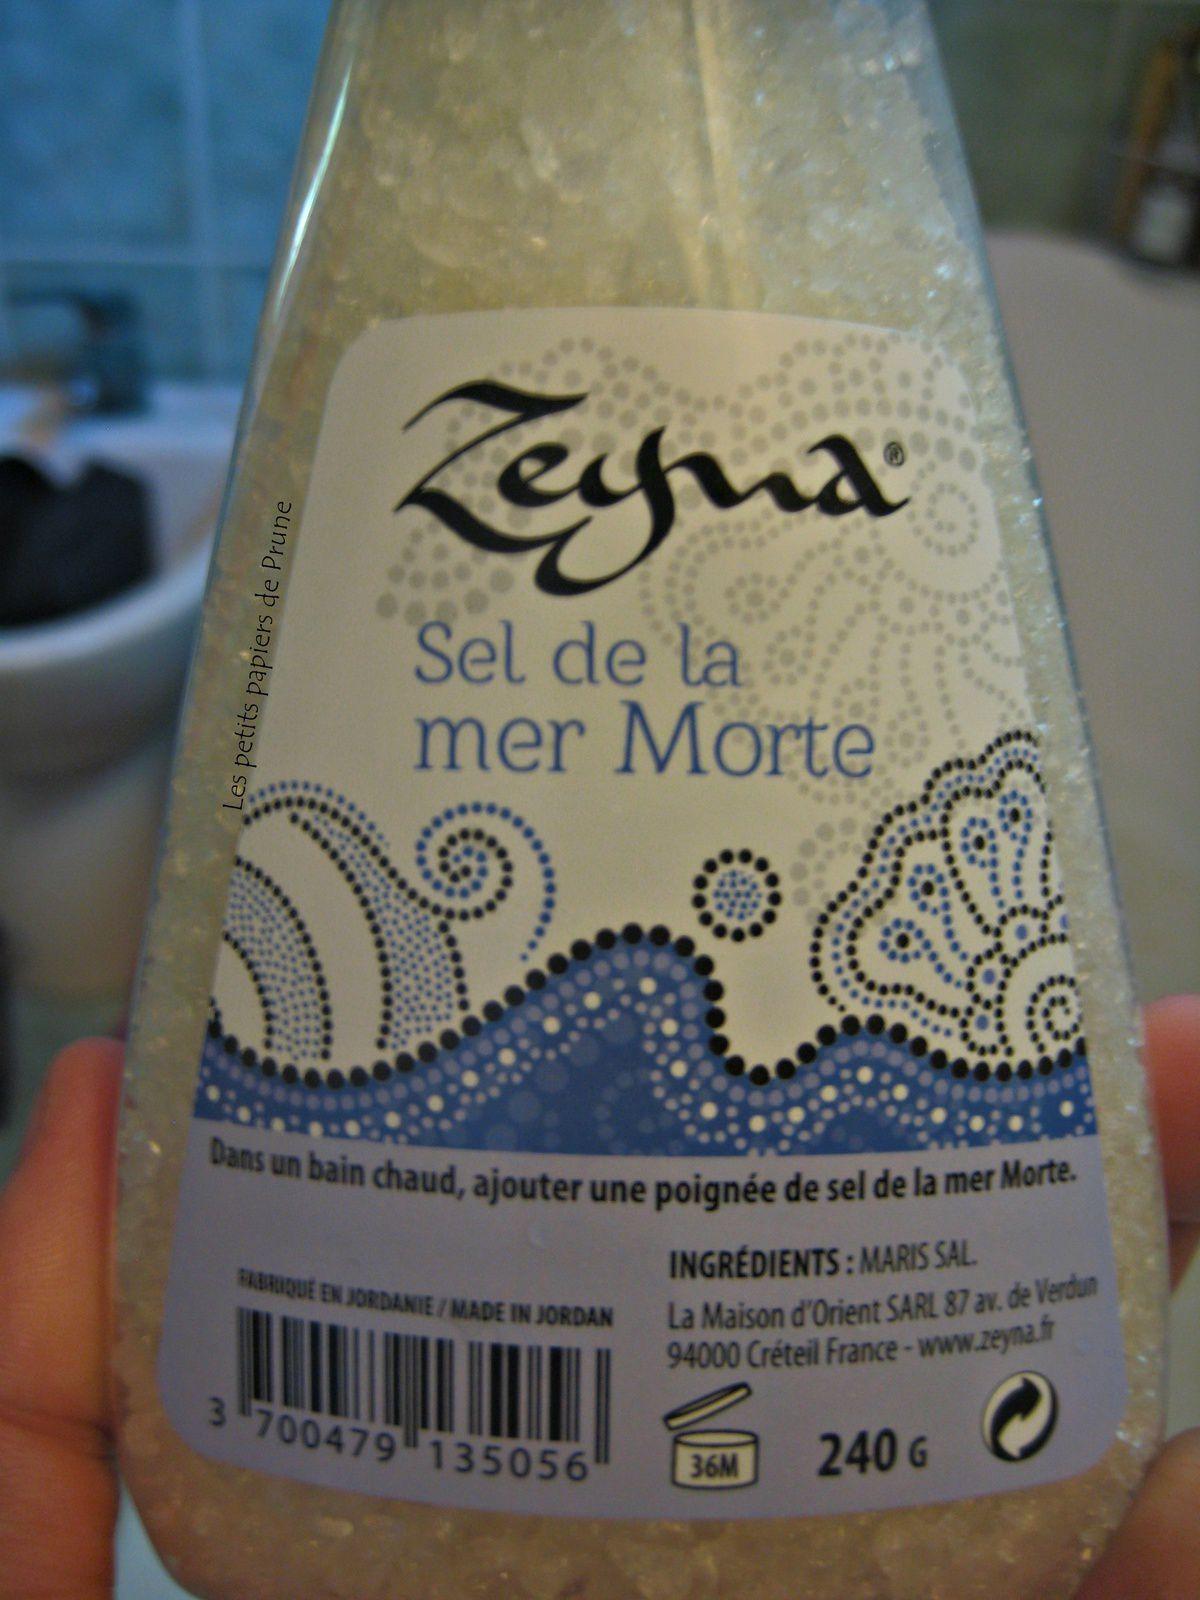 Zeyna - Sel de la mer morte